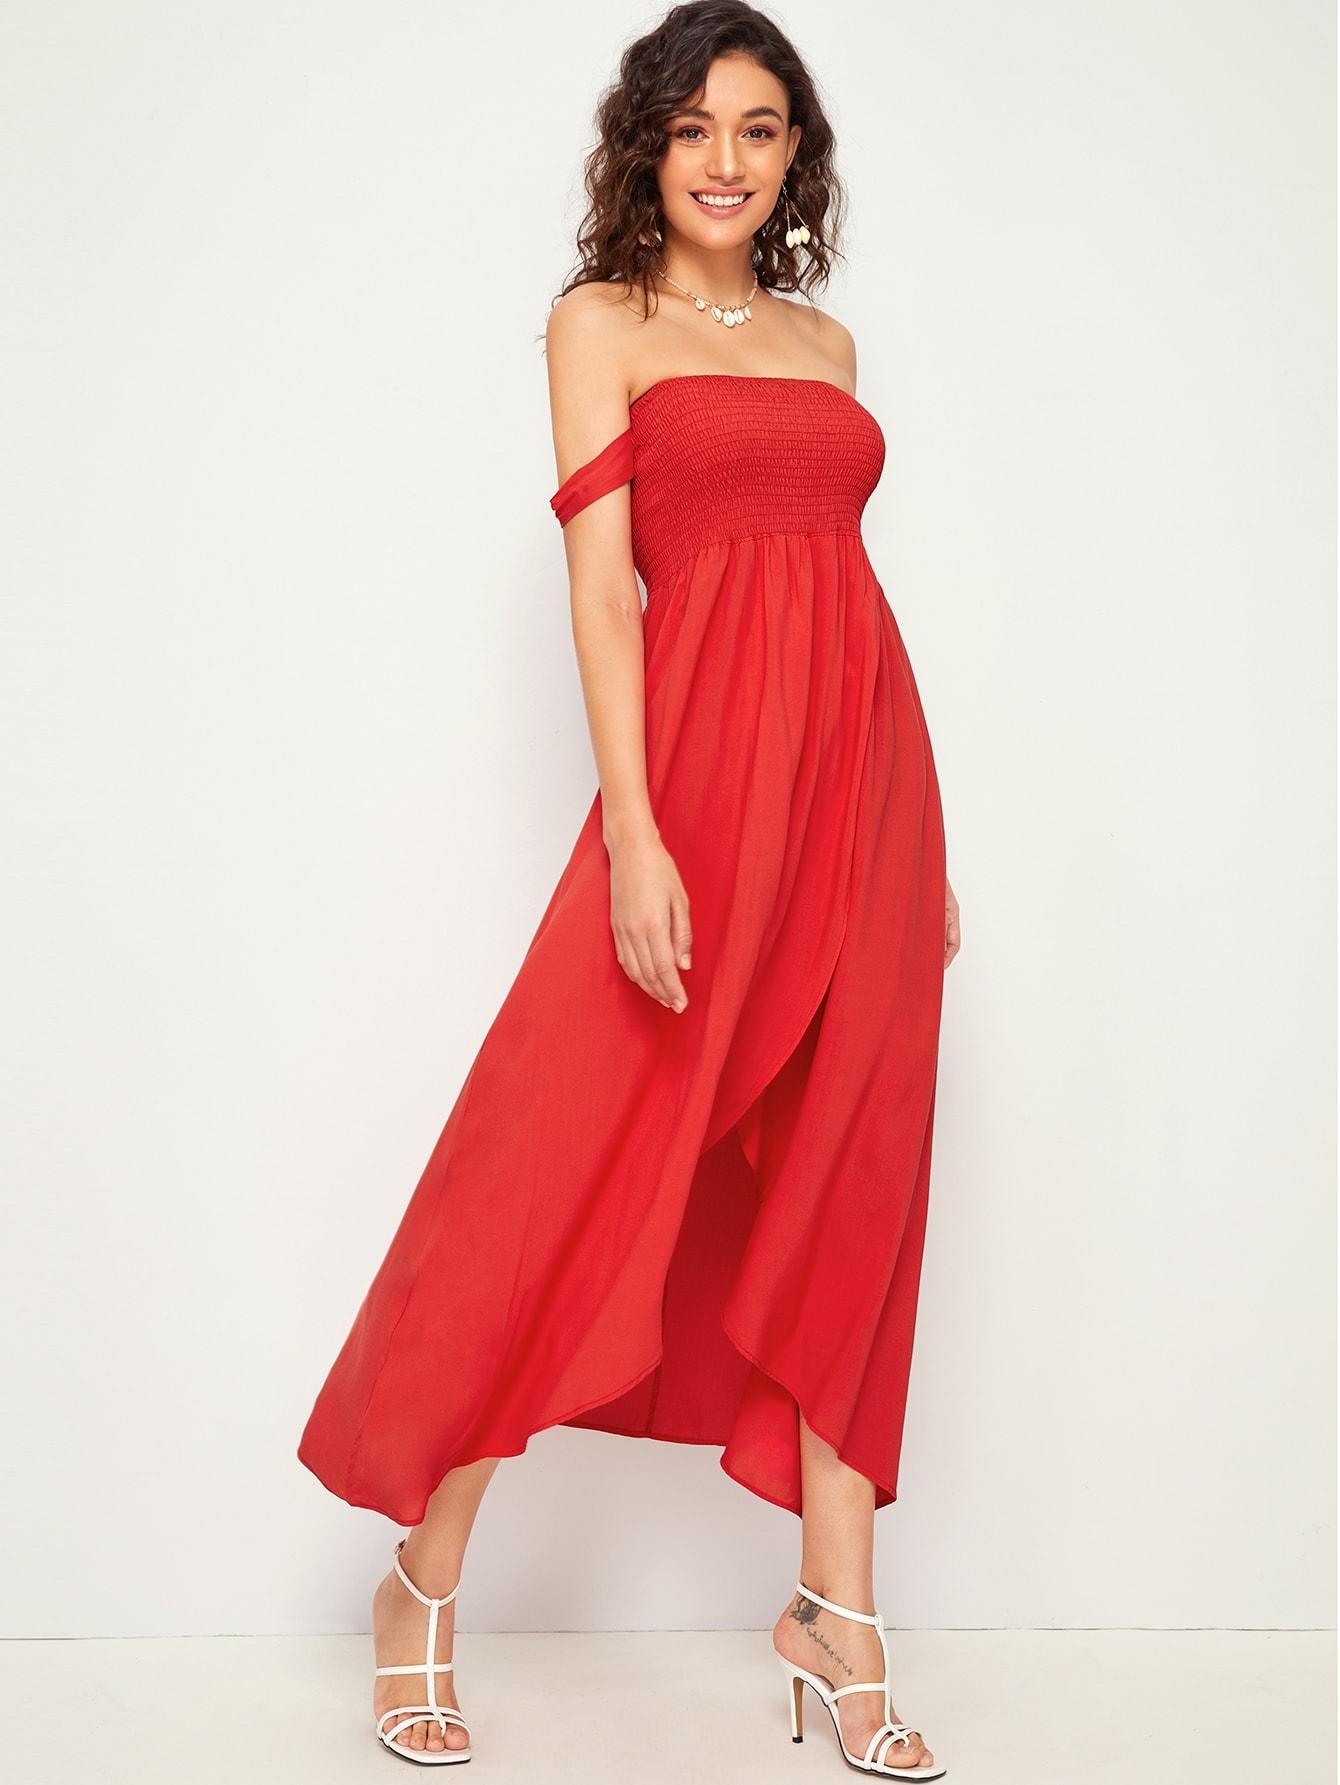 d9fdc4c0ac6a7 Off The Shoulder Tulip Hem Shirred Dress